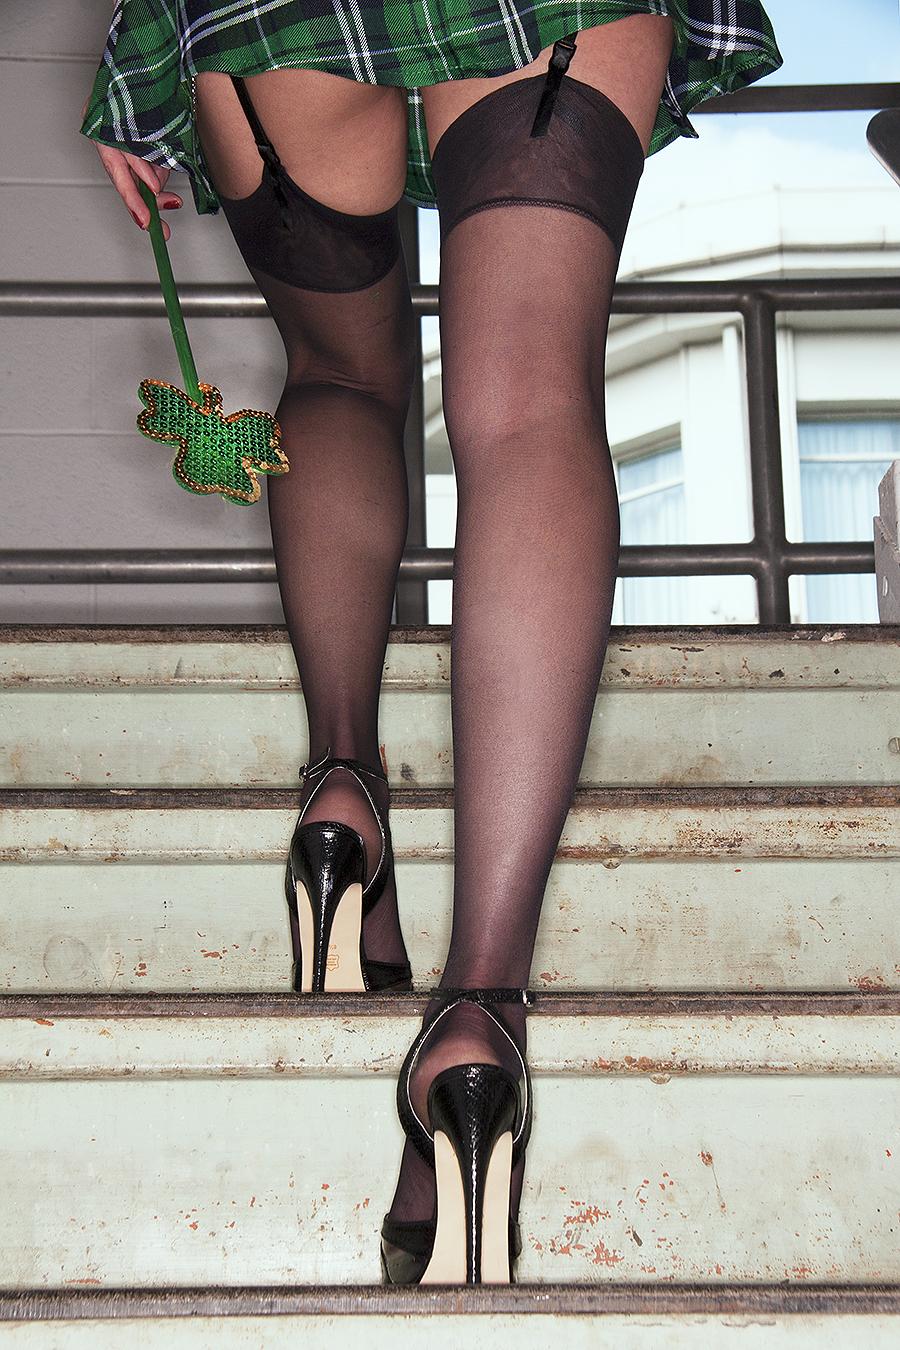 lucky lepricon high heels thigh highs upskirt st patricks day